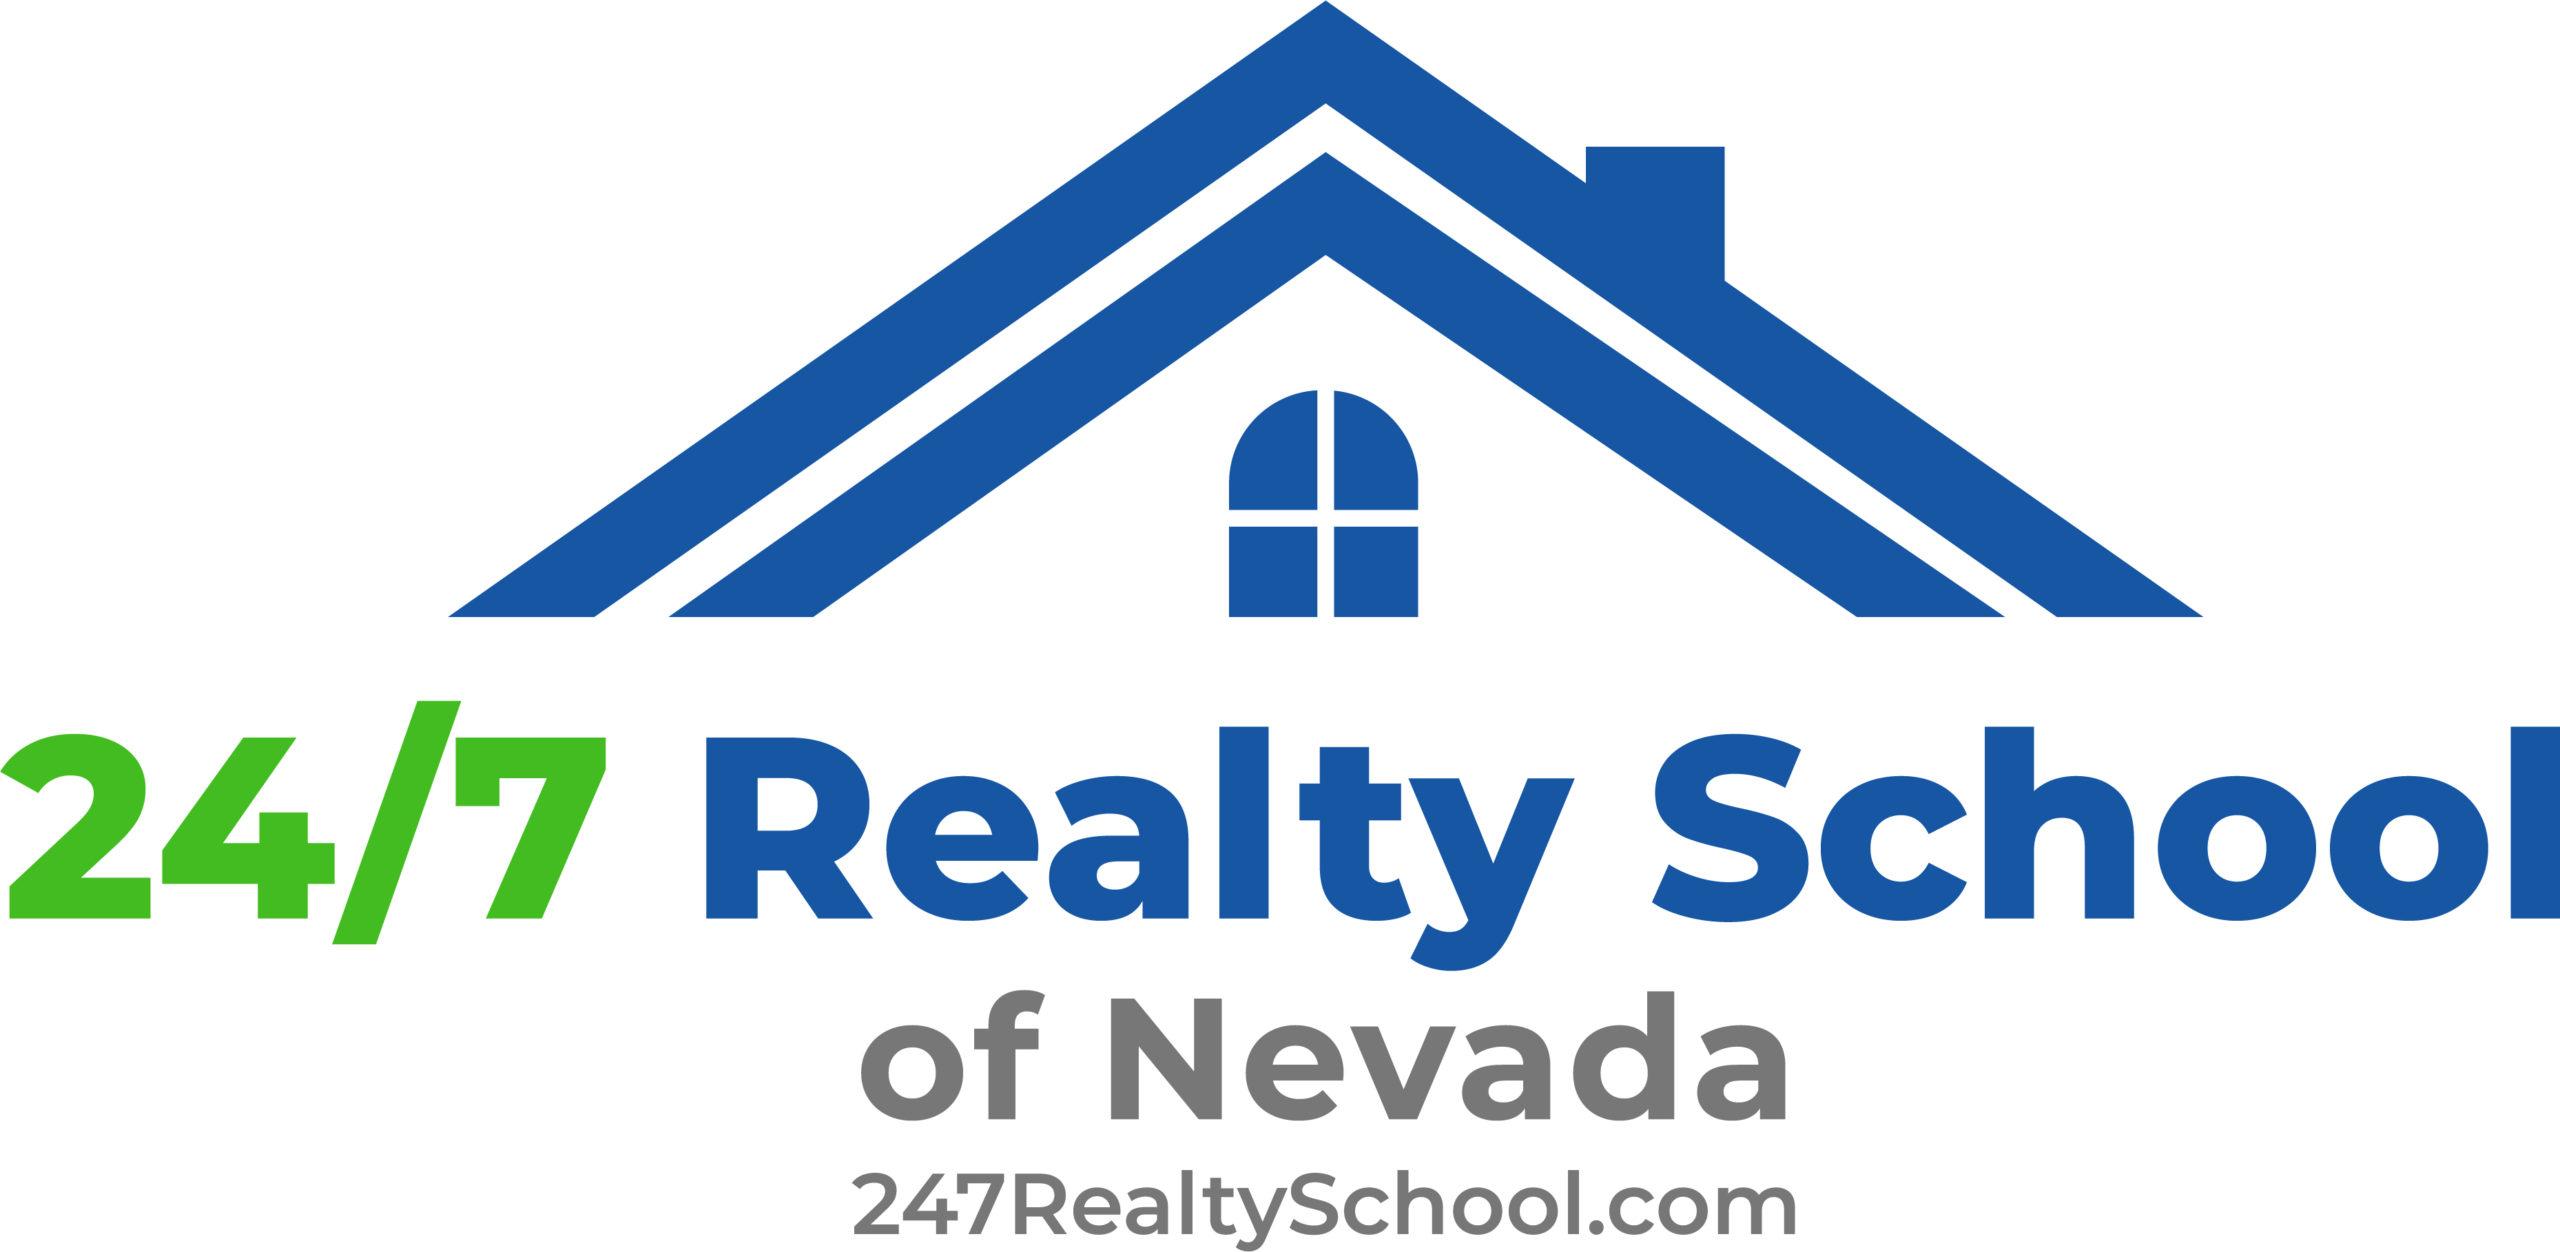 24/7 Realty School